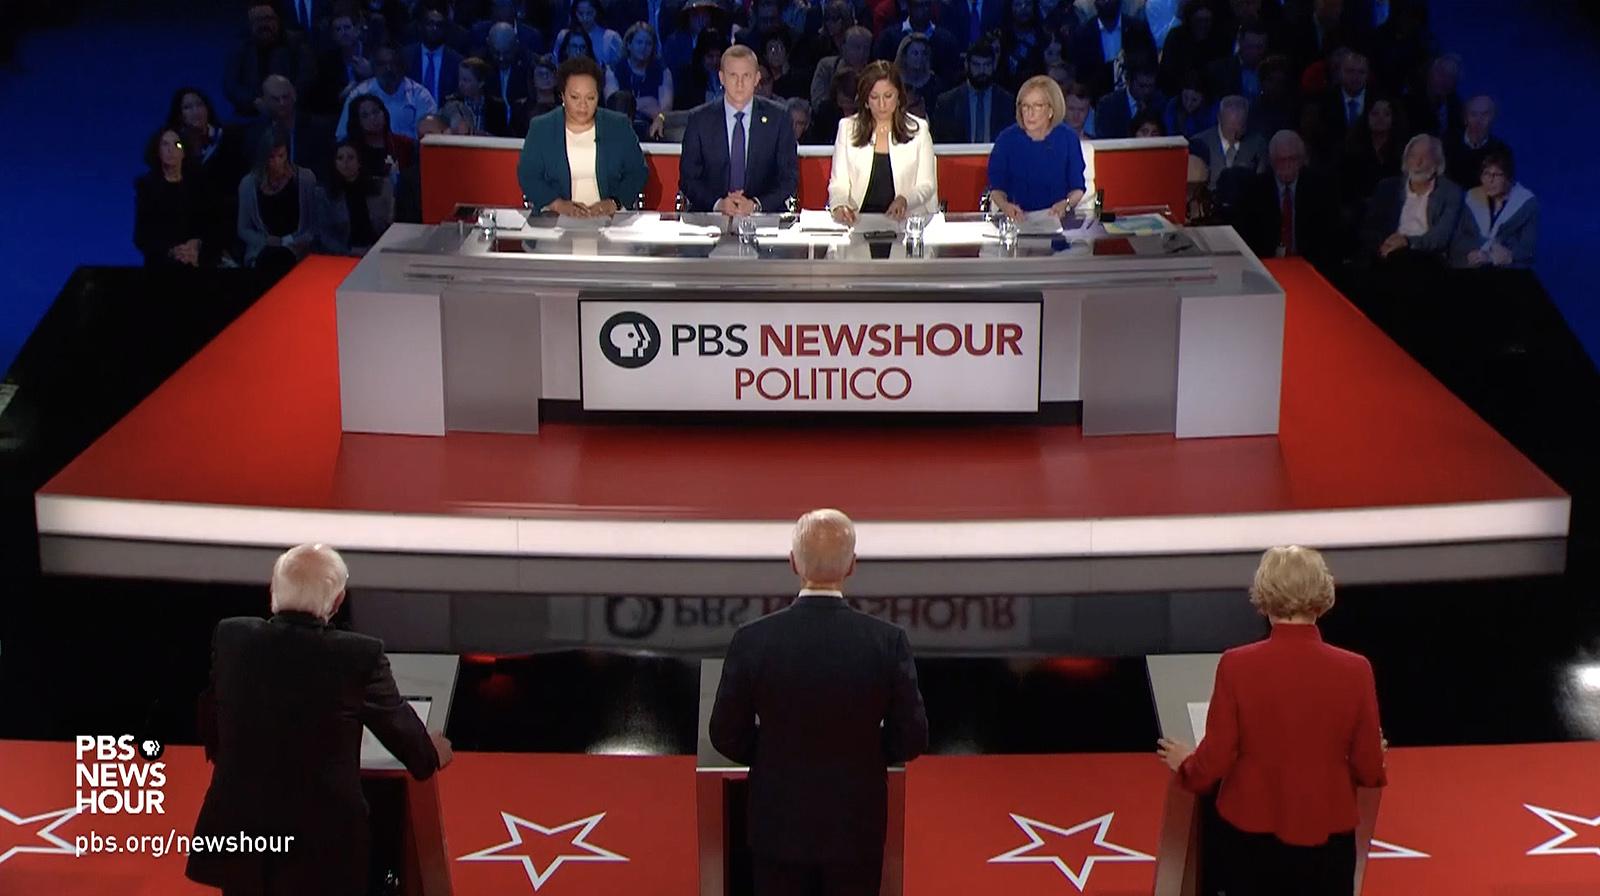 NCS_PBS-NewsHour_Politico_Democratic-Debate_009